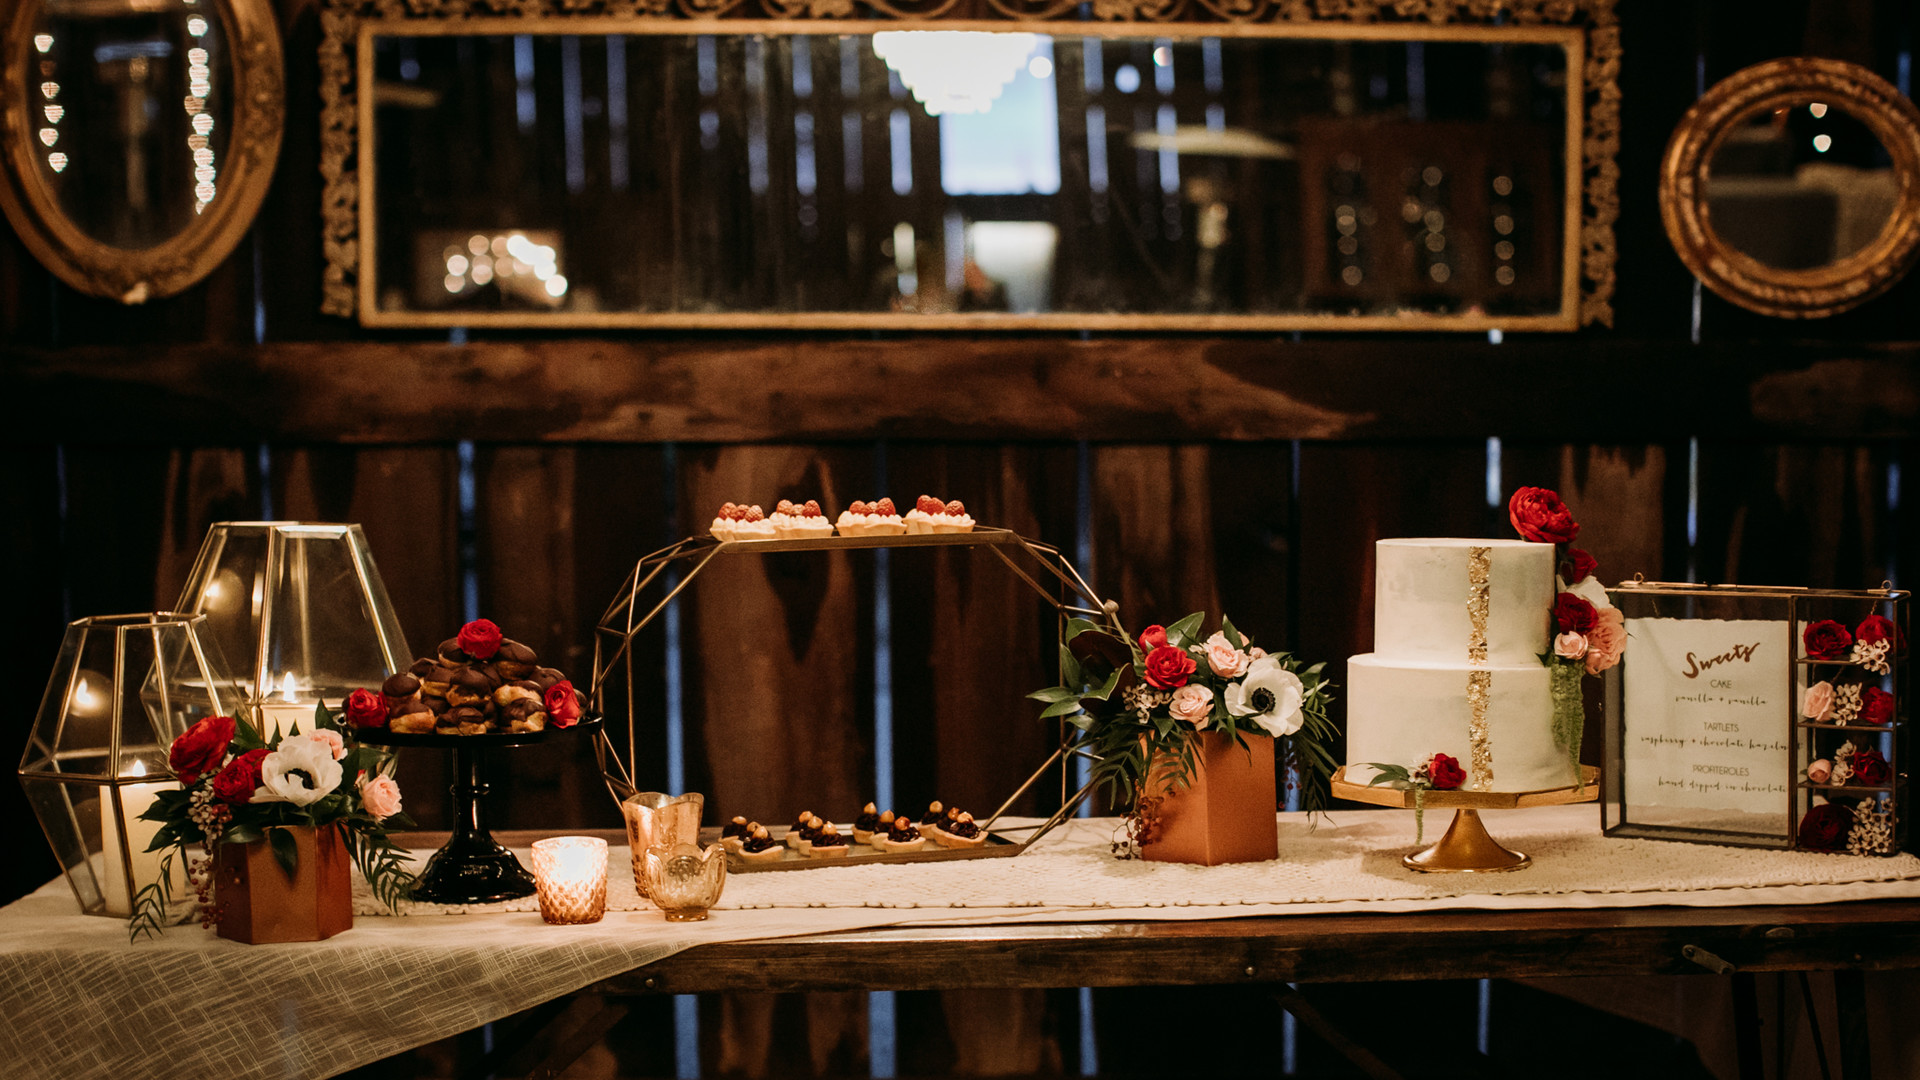 www.santabarbarawedding.com   Kacie Jones Photography   Dana Powers House   FM Events   S&O Dessert Co   Flourish   Blush Fine Linens   Embellish Vintage Rentals   All About Events   dessert table